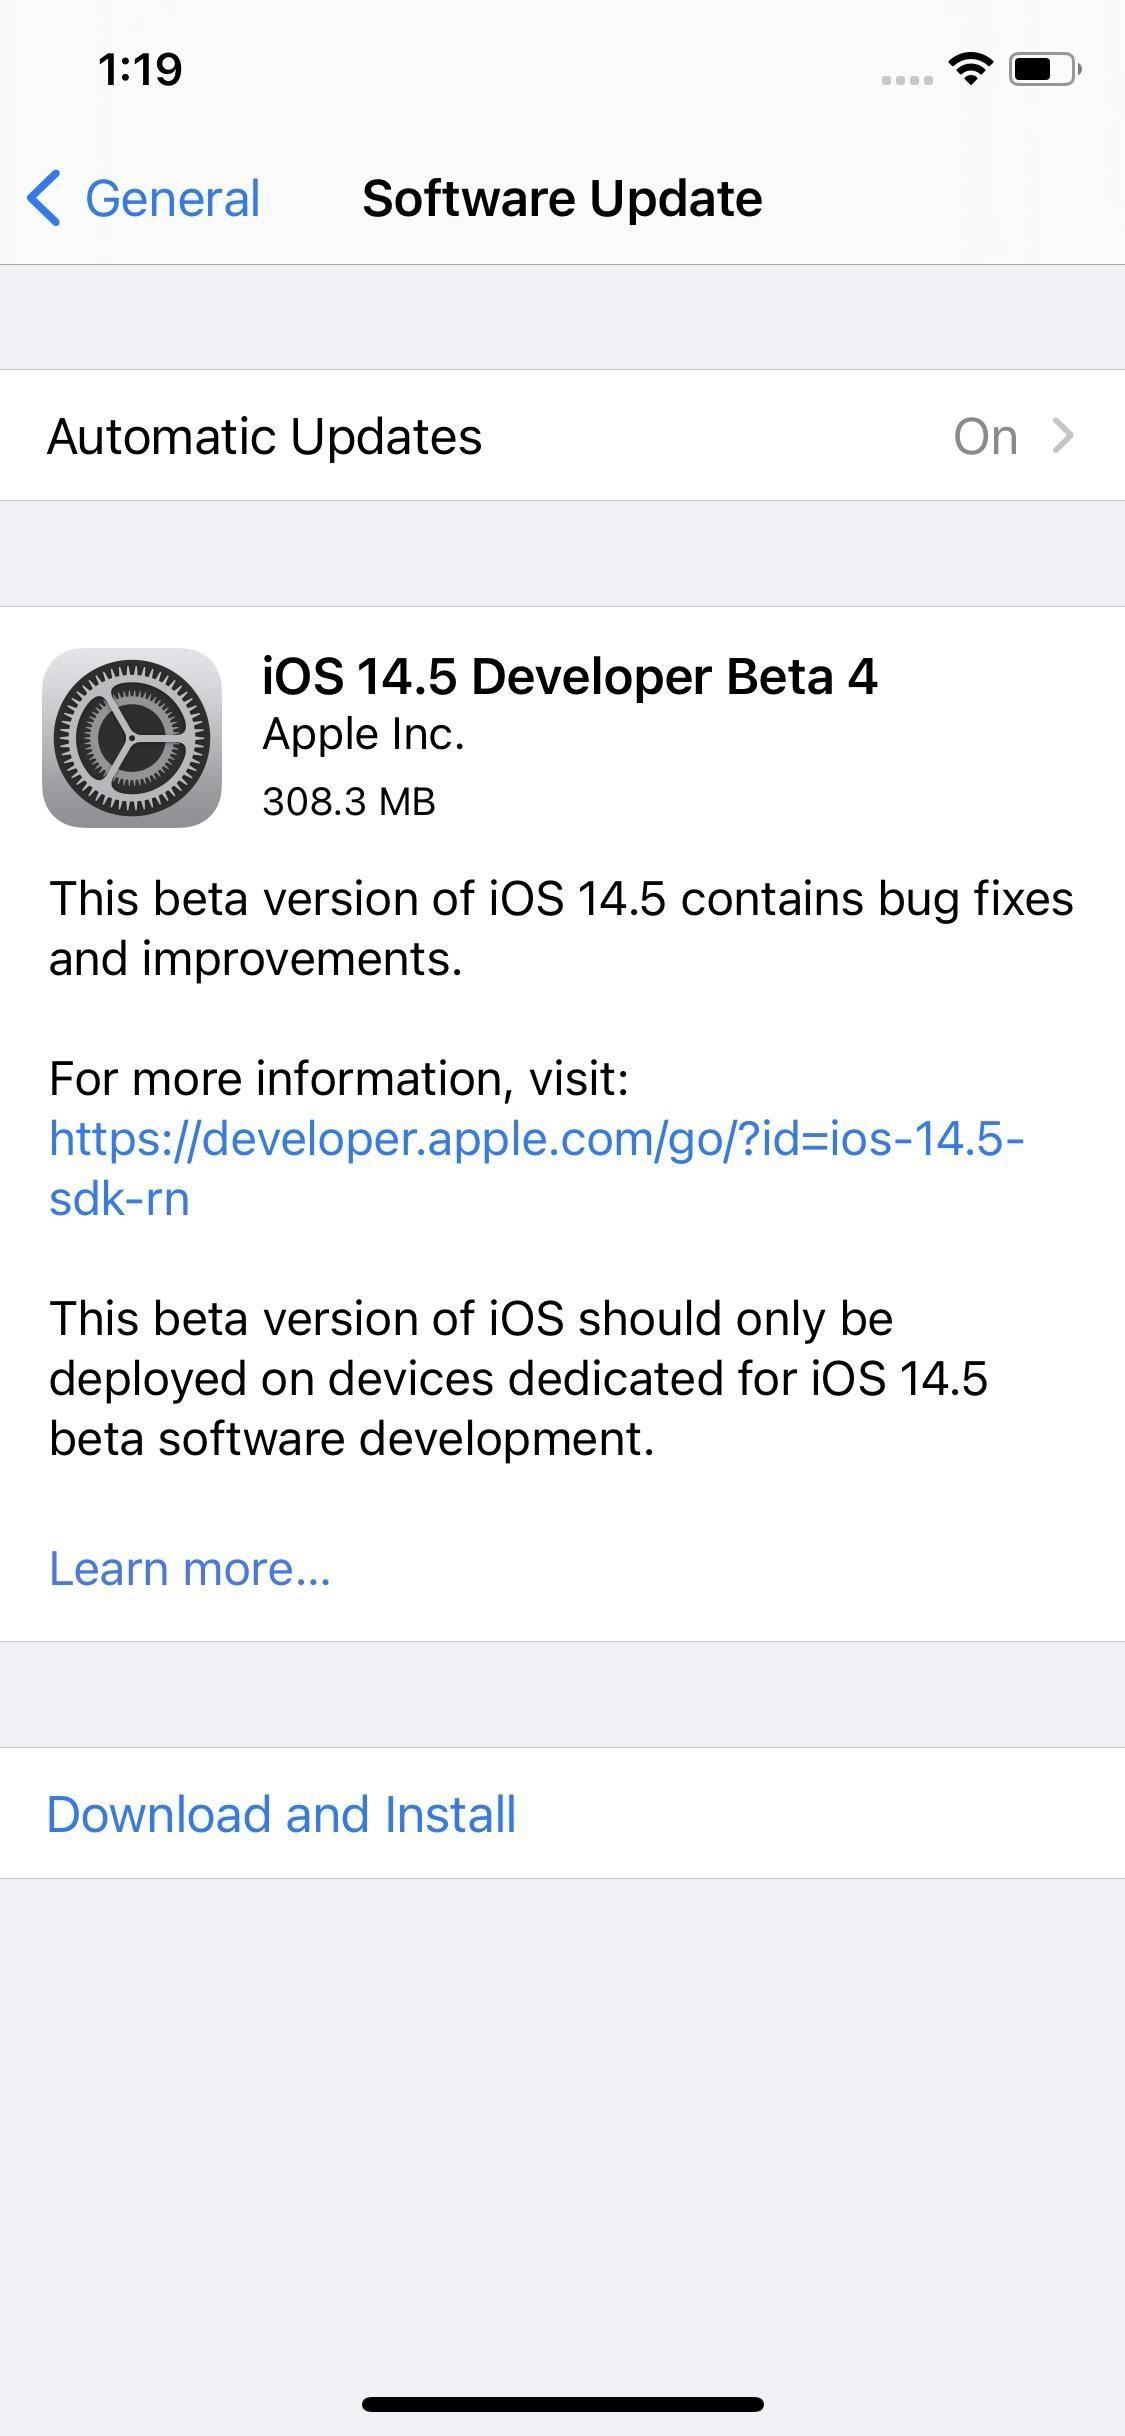 Apple Releases iOS 14.5 Developer Beta 4 for iPhone